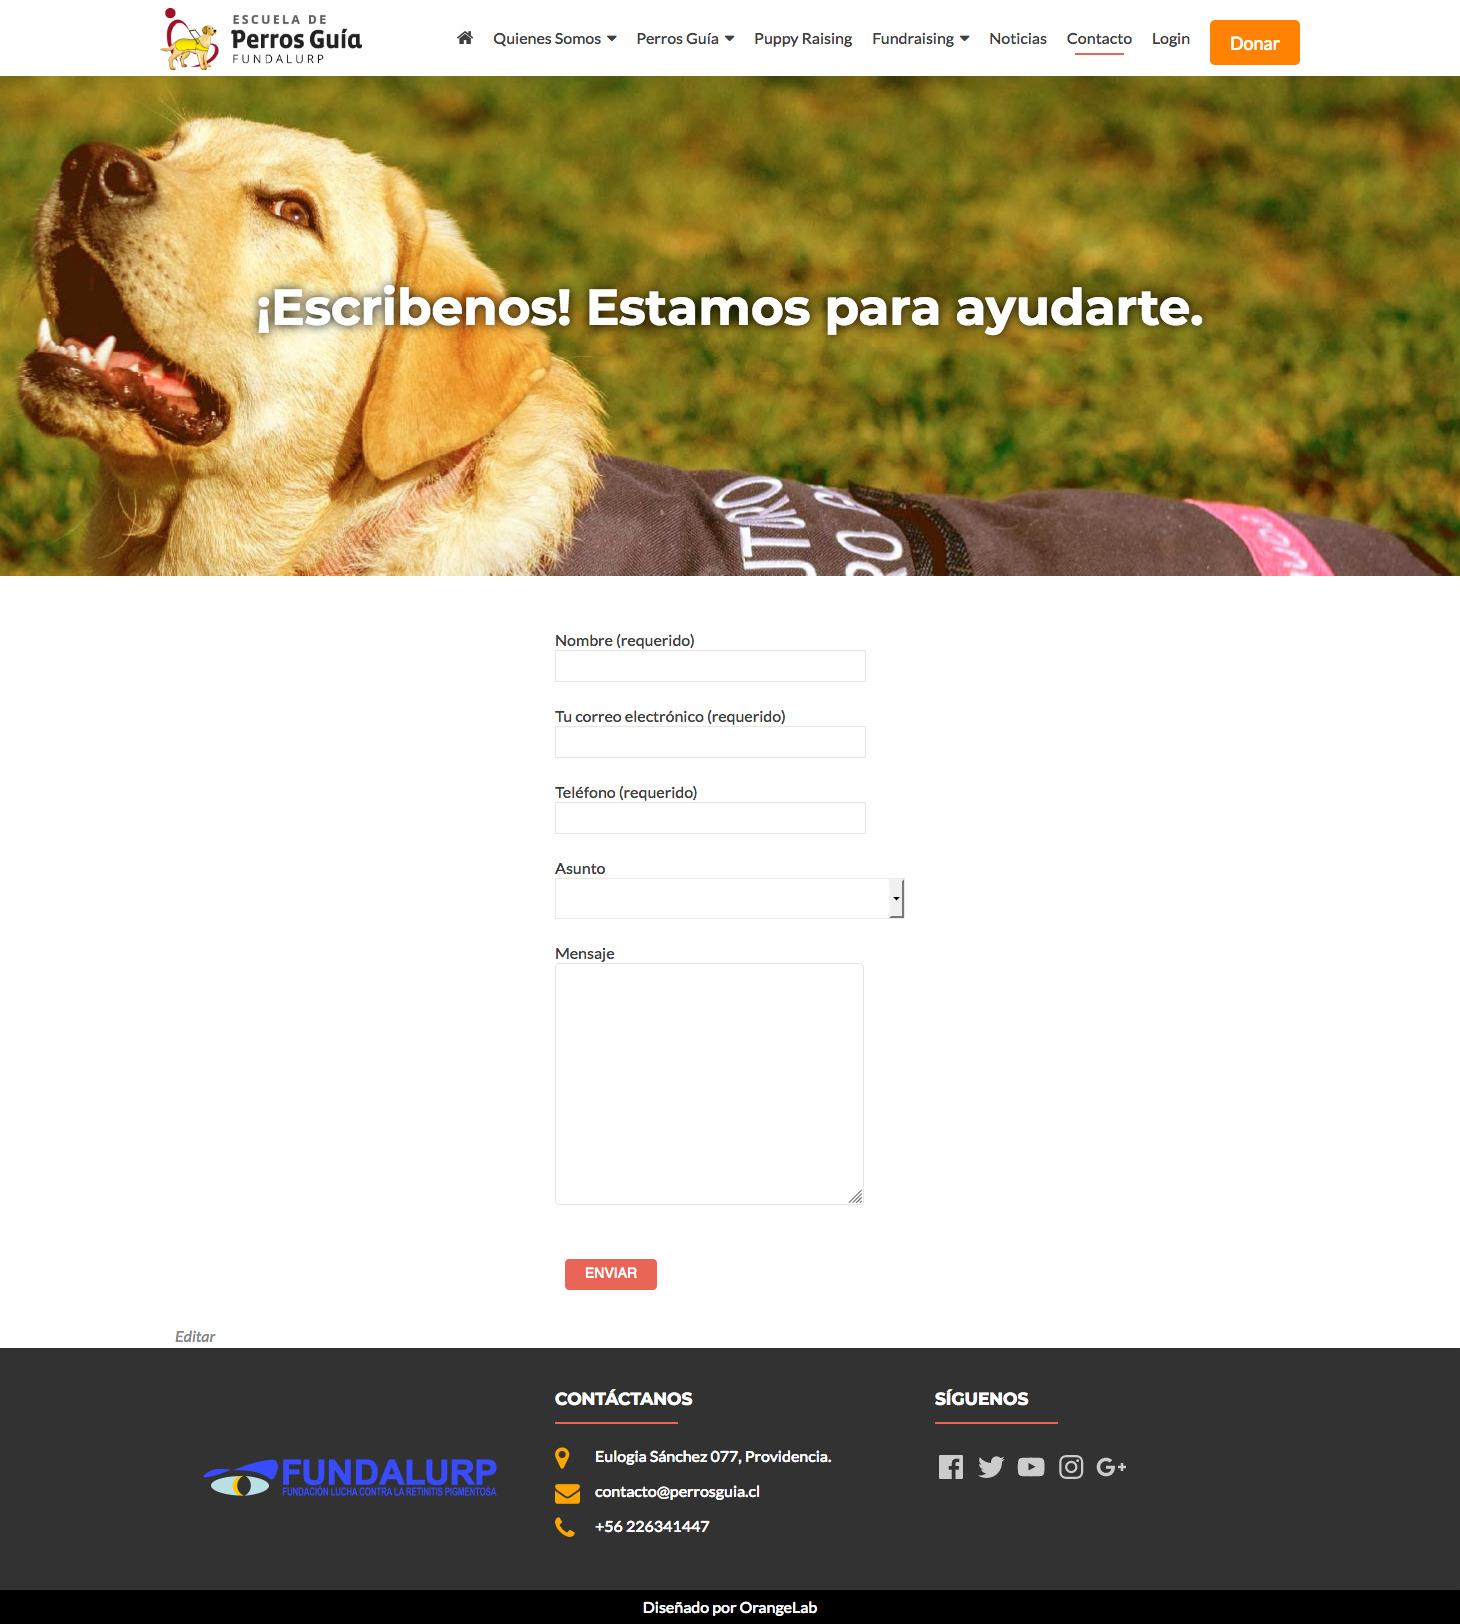 Screenshot_2018-07-15 Contacto - Escuela de Perros Guía Fundalurp